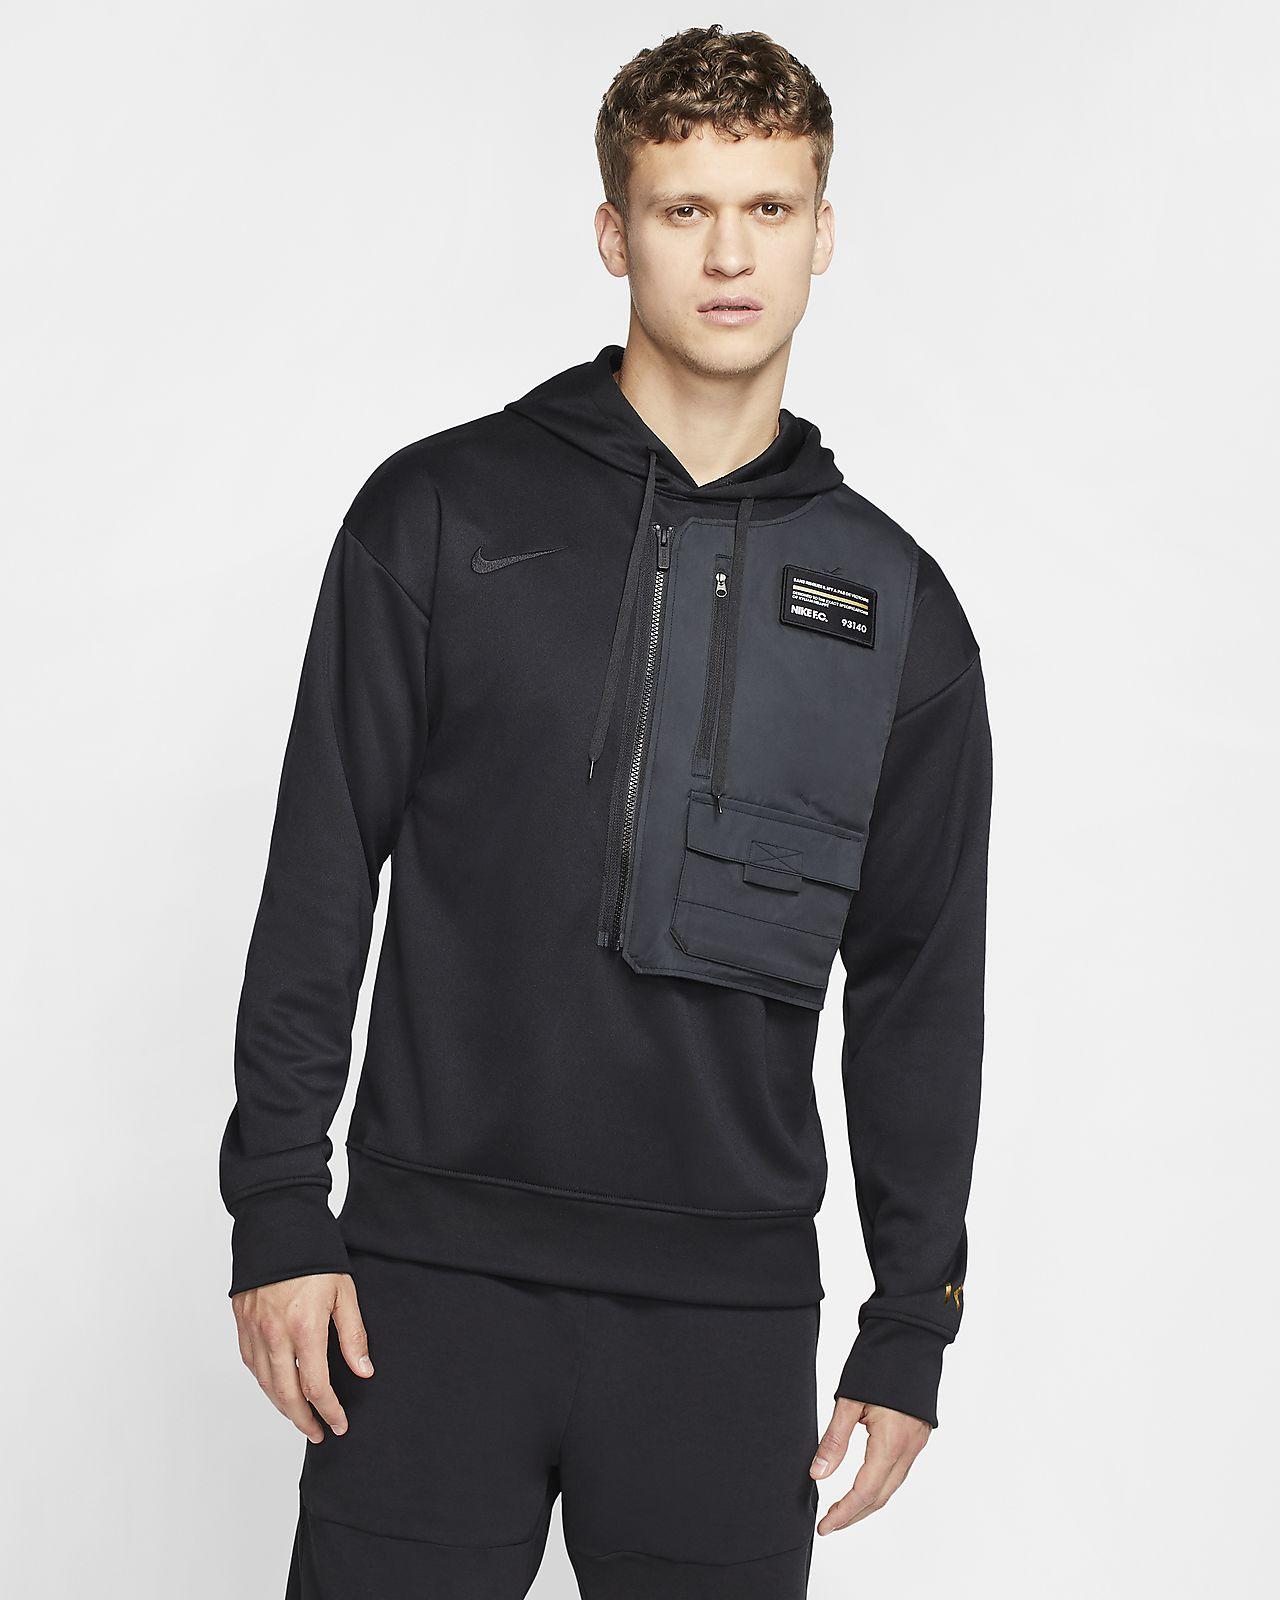 Nike Dri-FIT Bondy Sudadera con capucha de fútbol - Hombre